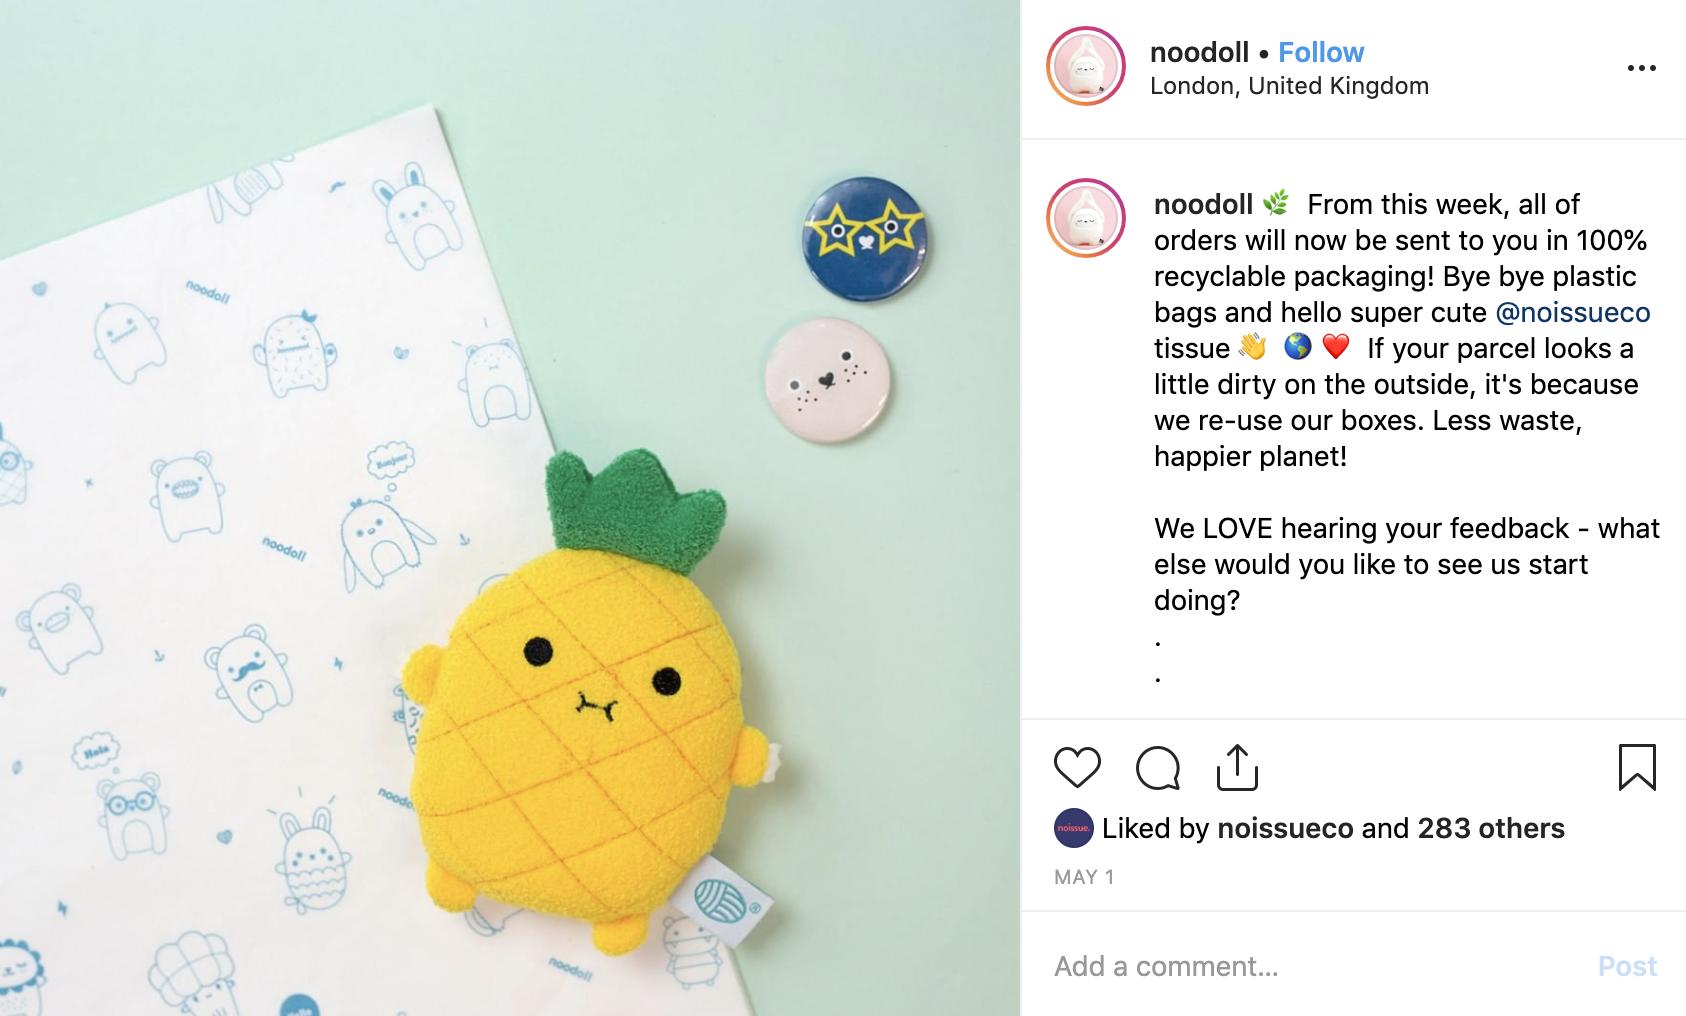 Noodoll toy lying on custom tissue paper